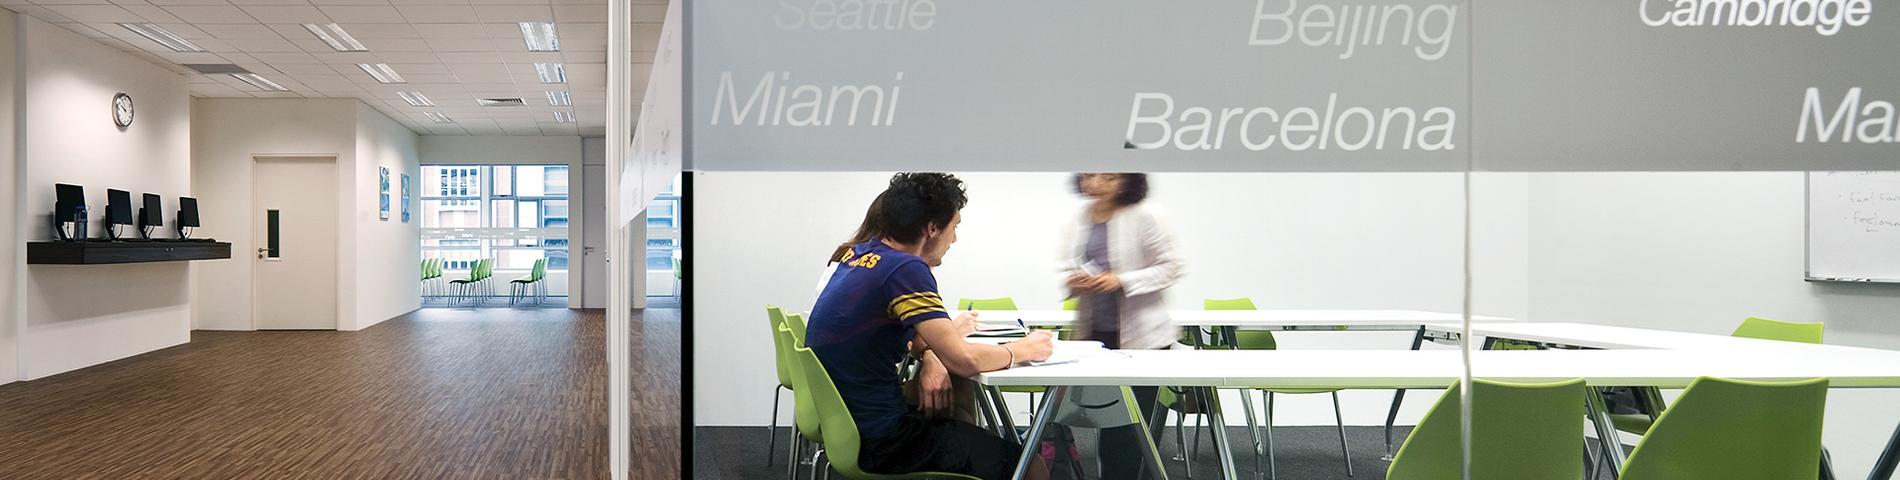 EF International Language Center画像1